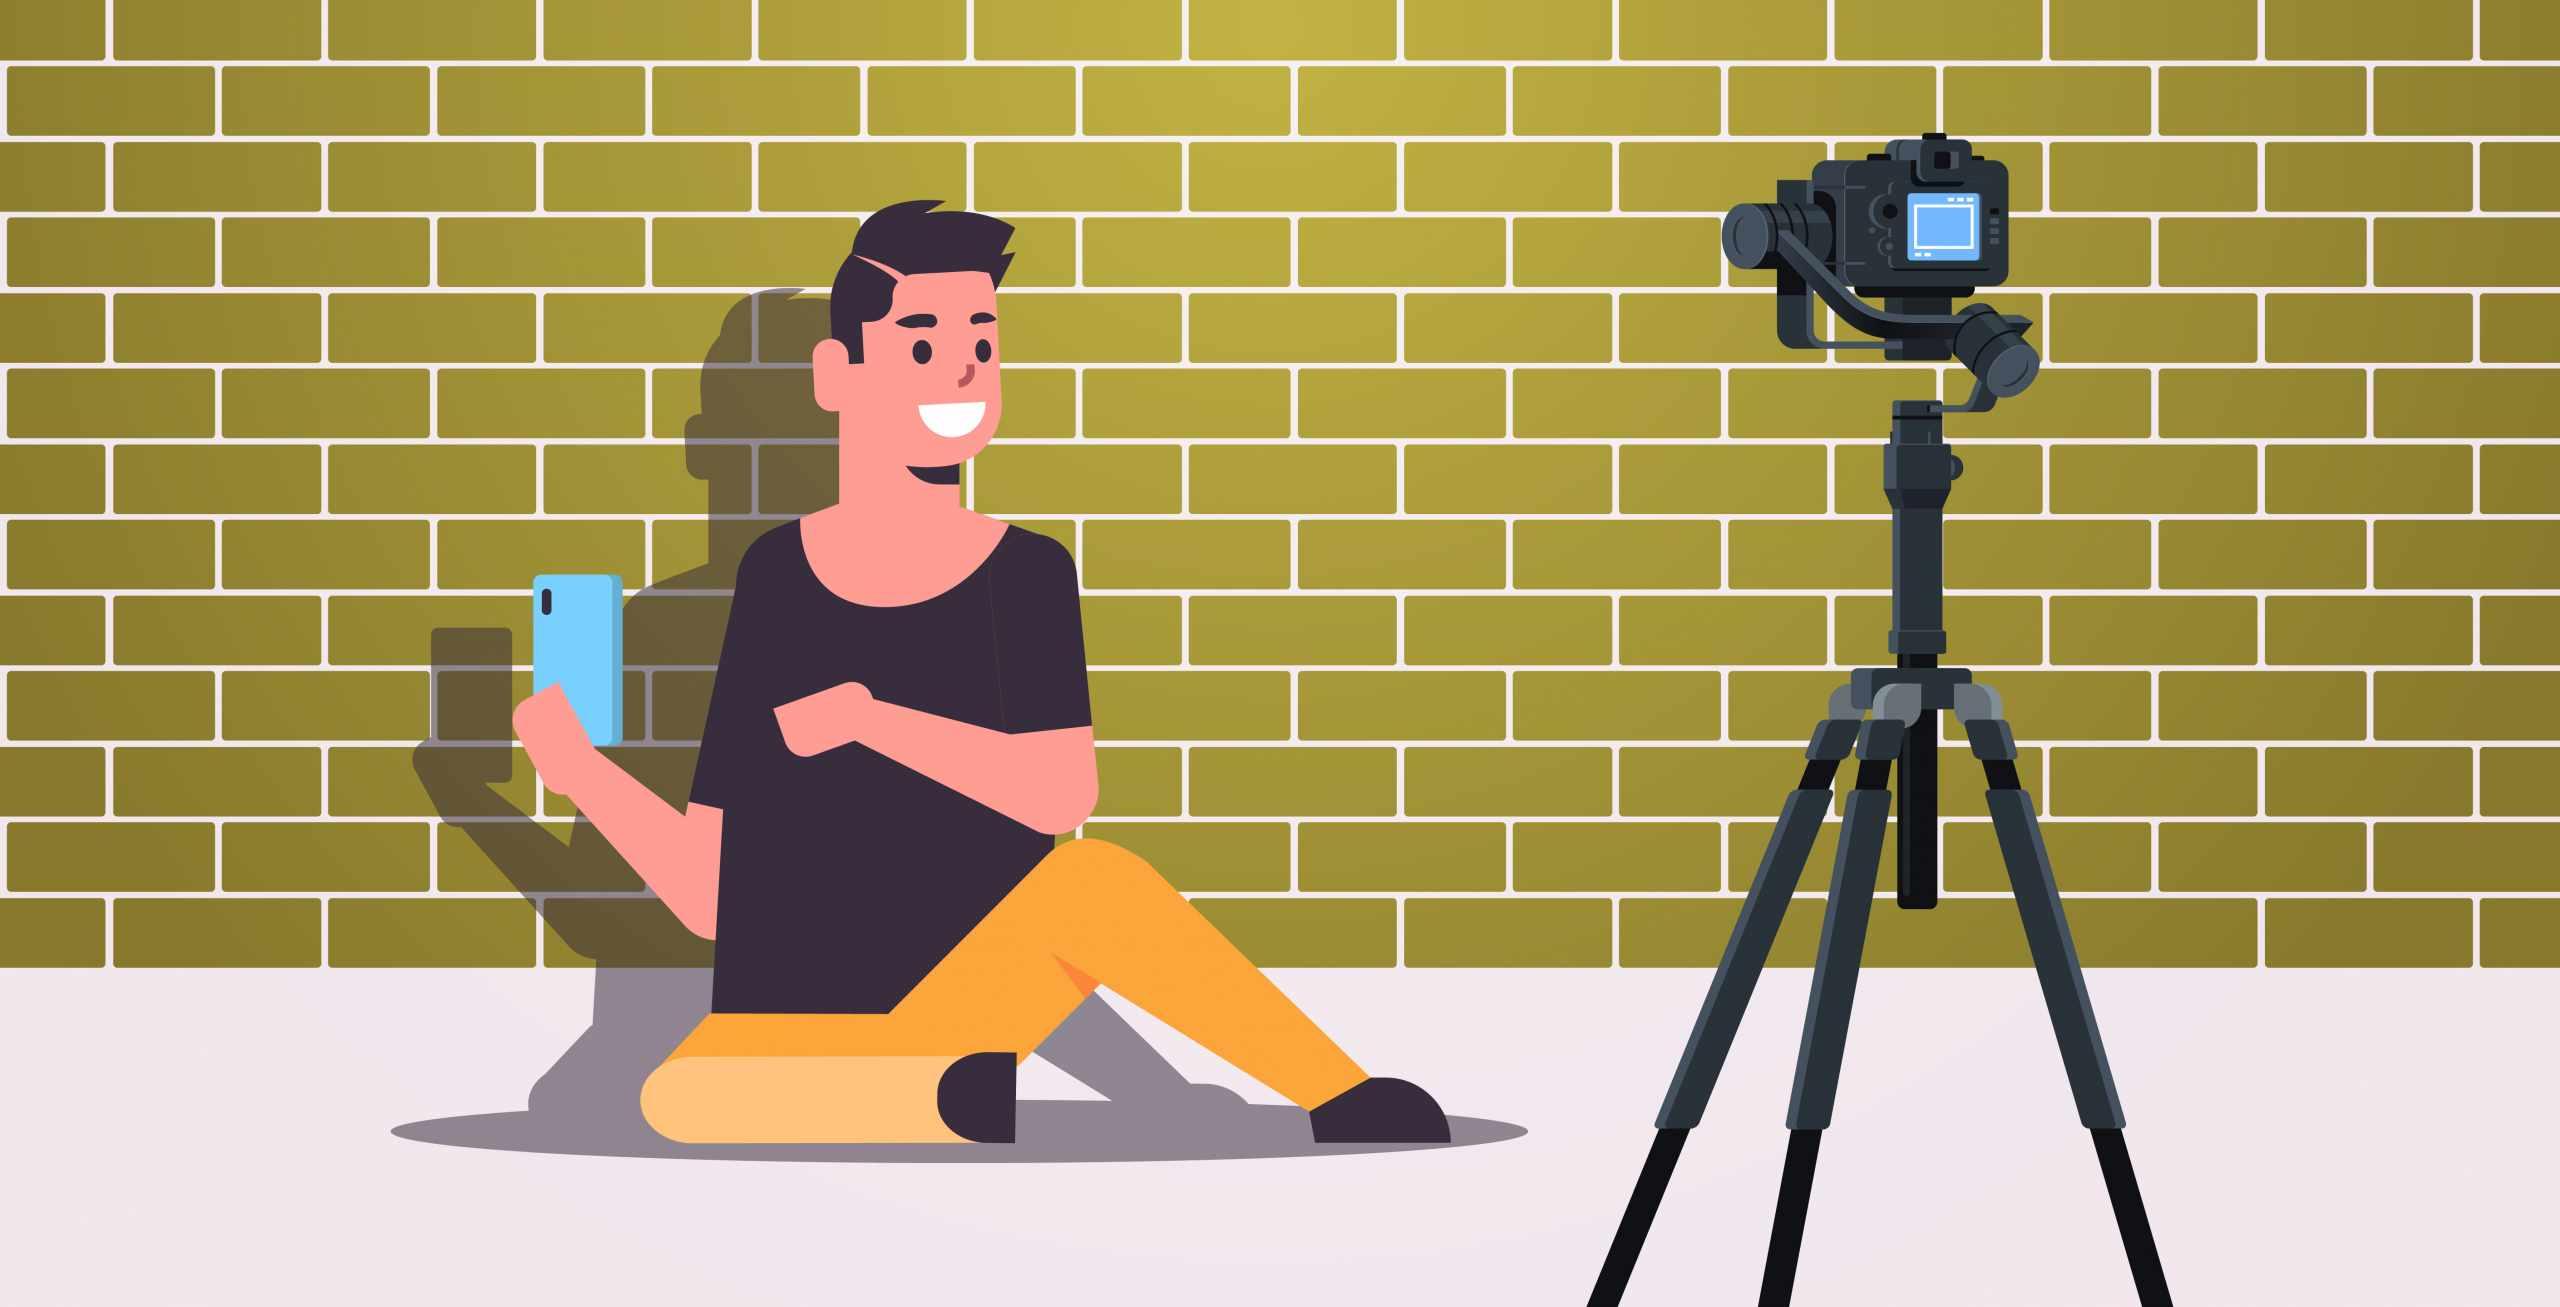 MAKE EXPLAINER VIDEOS BY DOING LESS